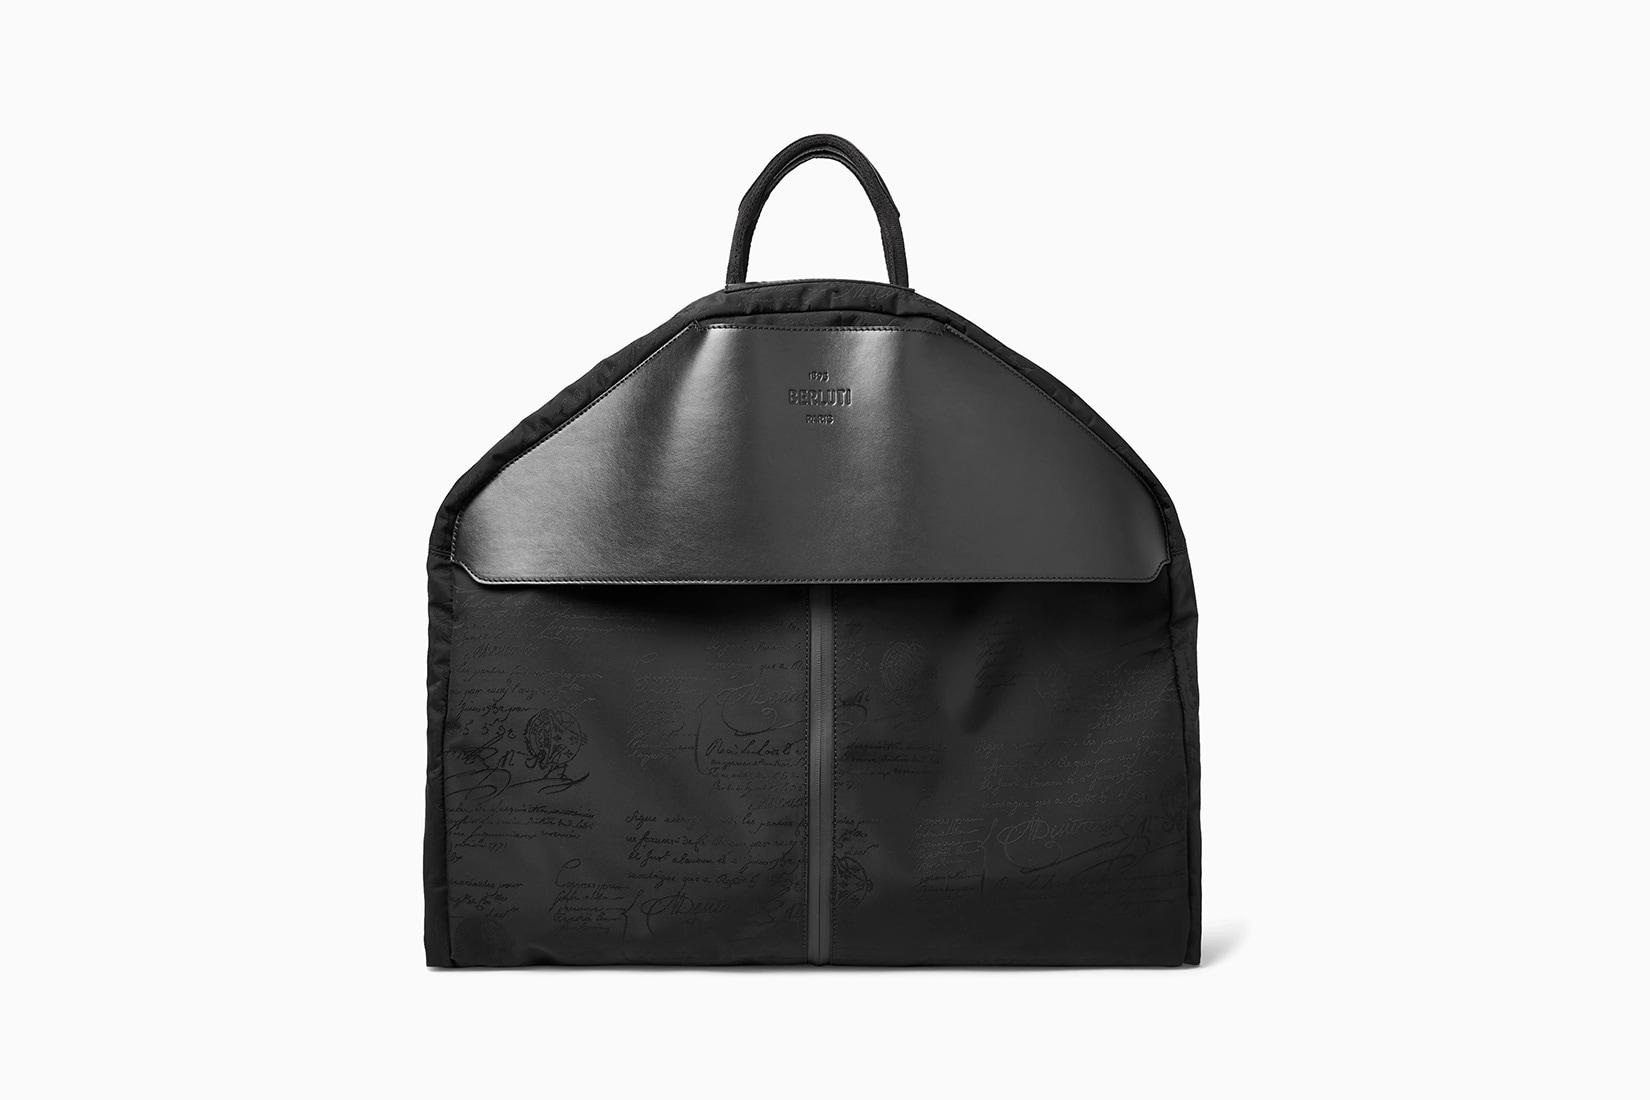 best garment bags expensive berluti review - Luxe Digital